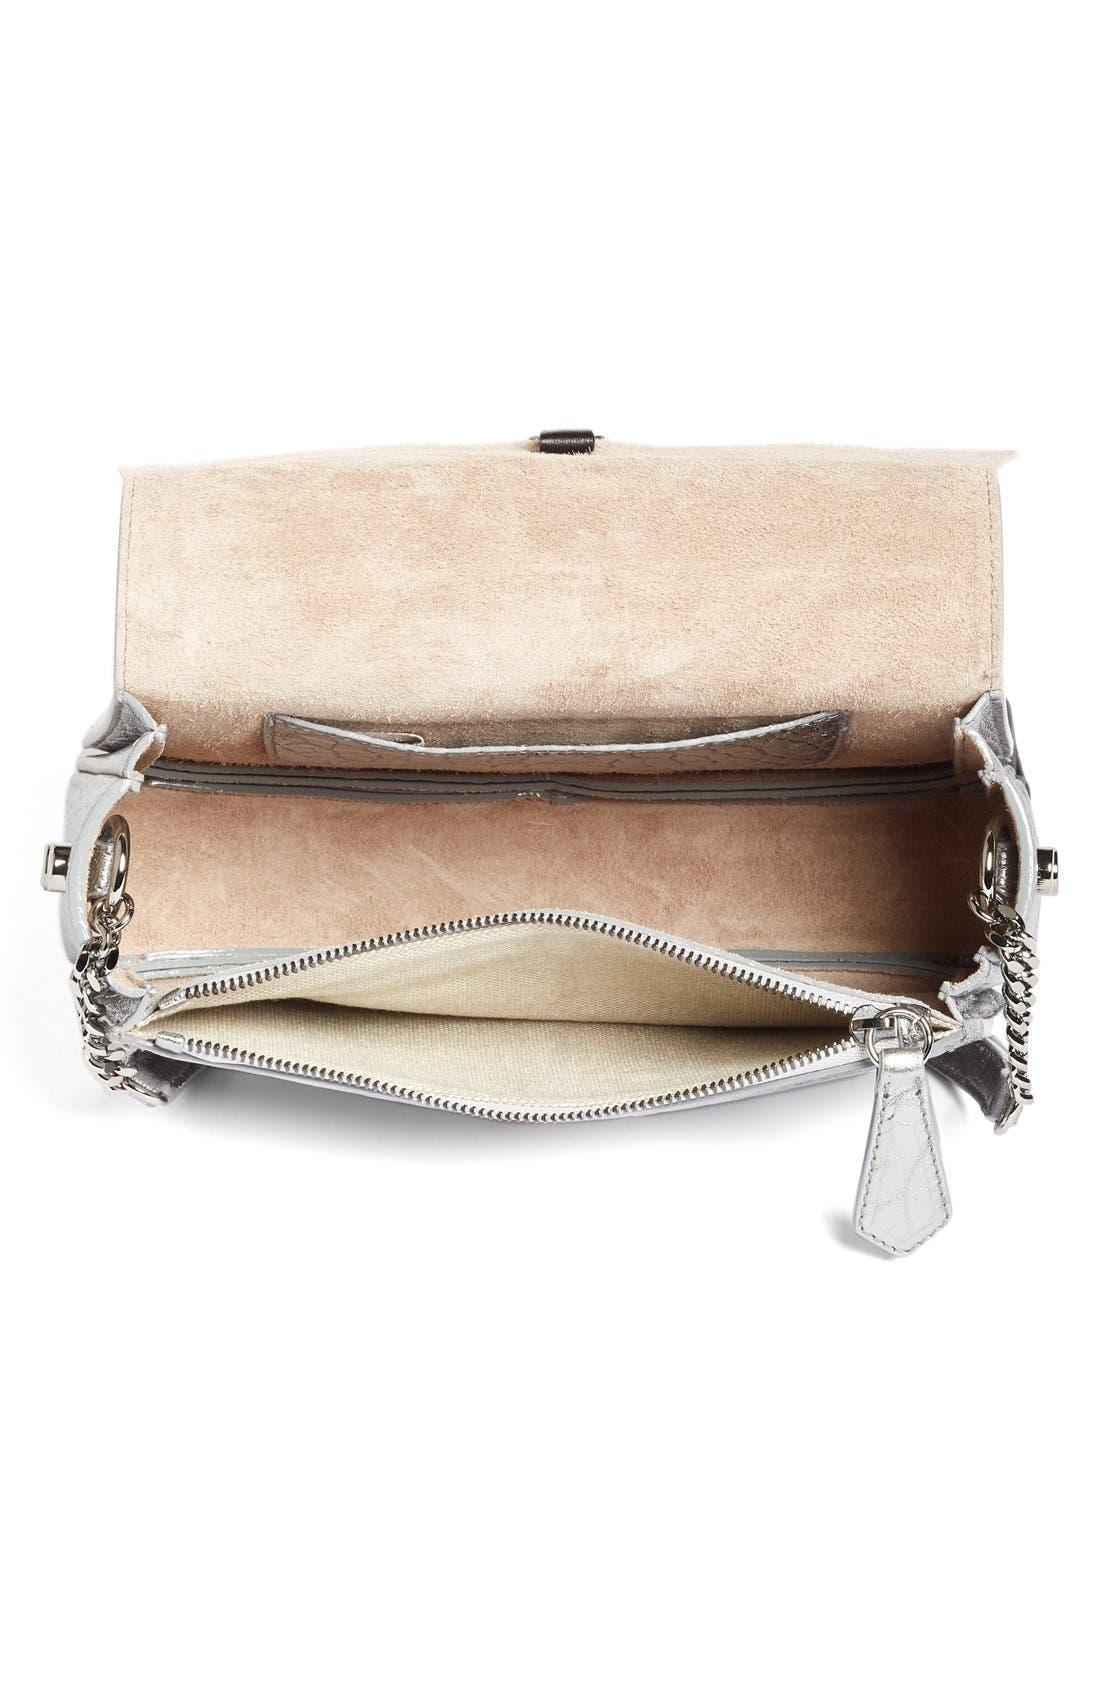 Arrow Metallic Grained Leather Shoulder Bag,                             Alternate thumbnail 4, color,                             045